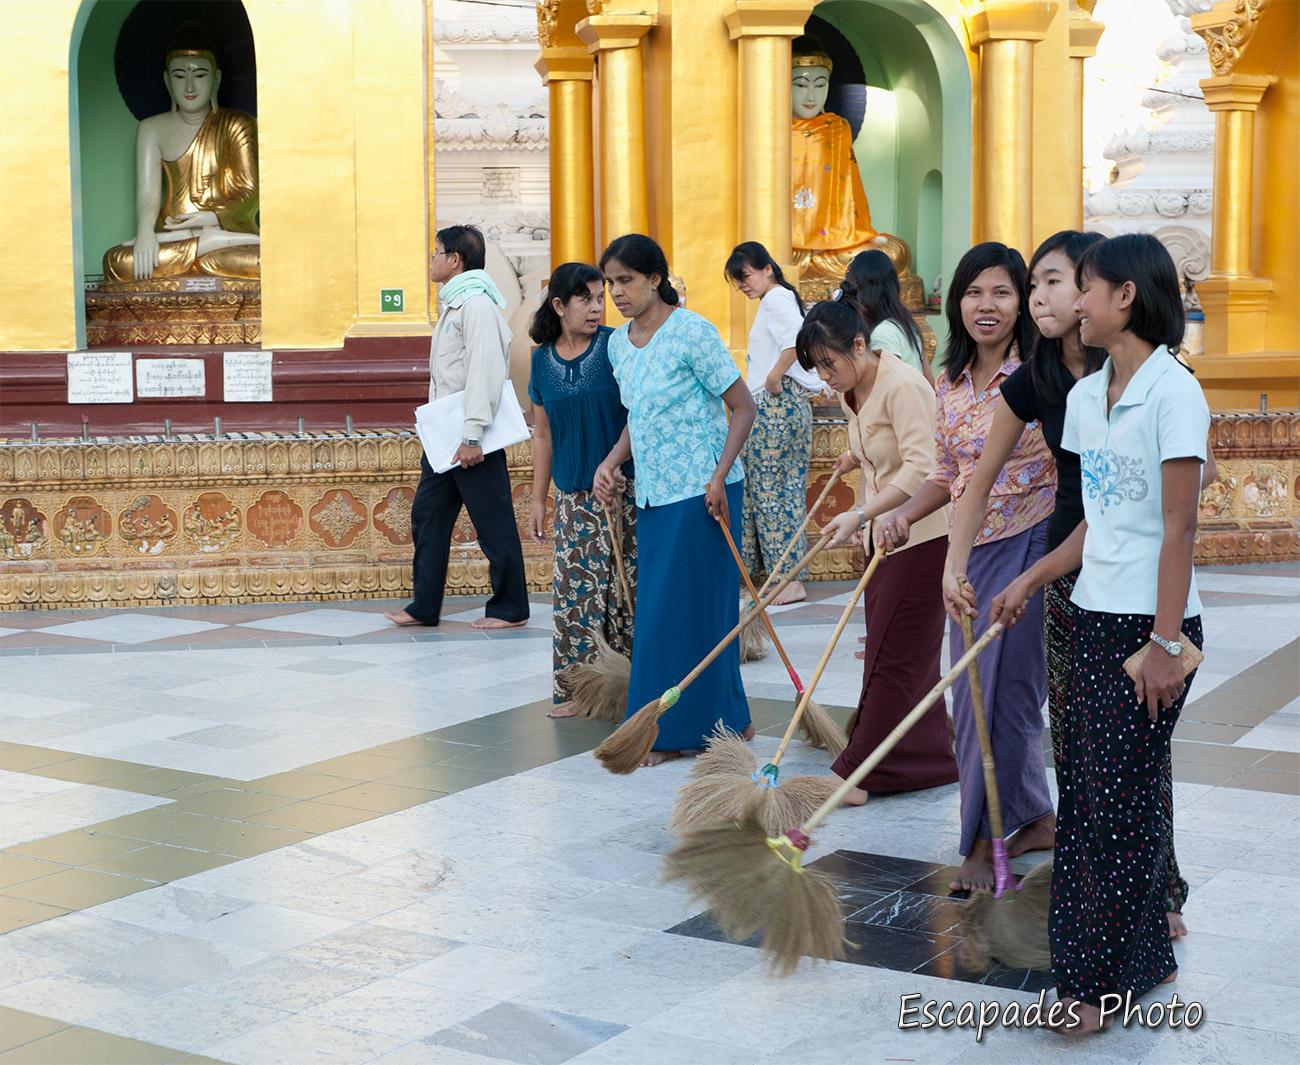 Balayage du sol - Pagode Shwedagon